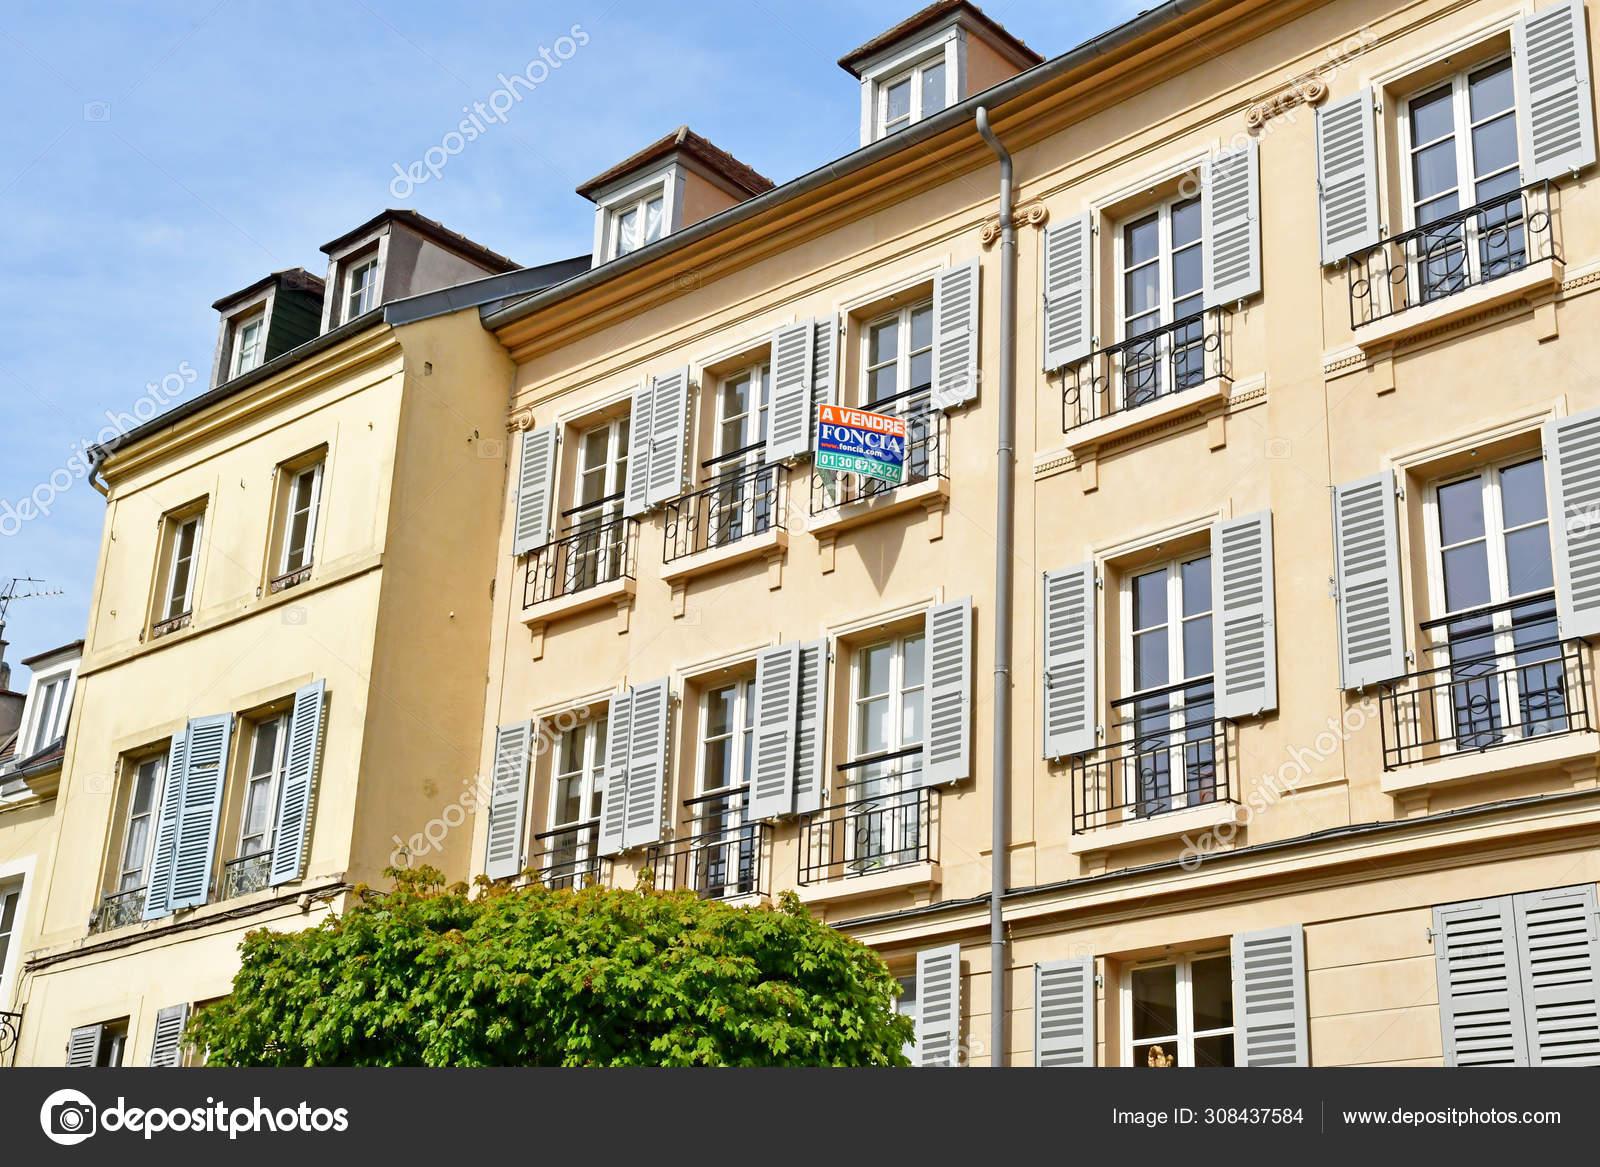 Home St Germain En Laye saint germain en laye; france - april 20 2019 : city centre